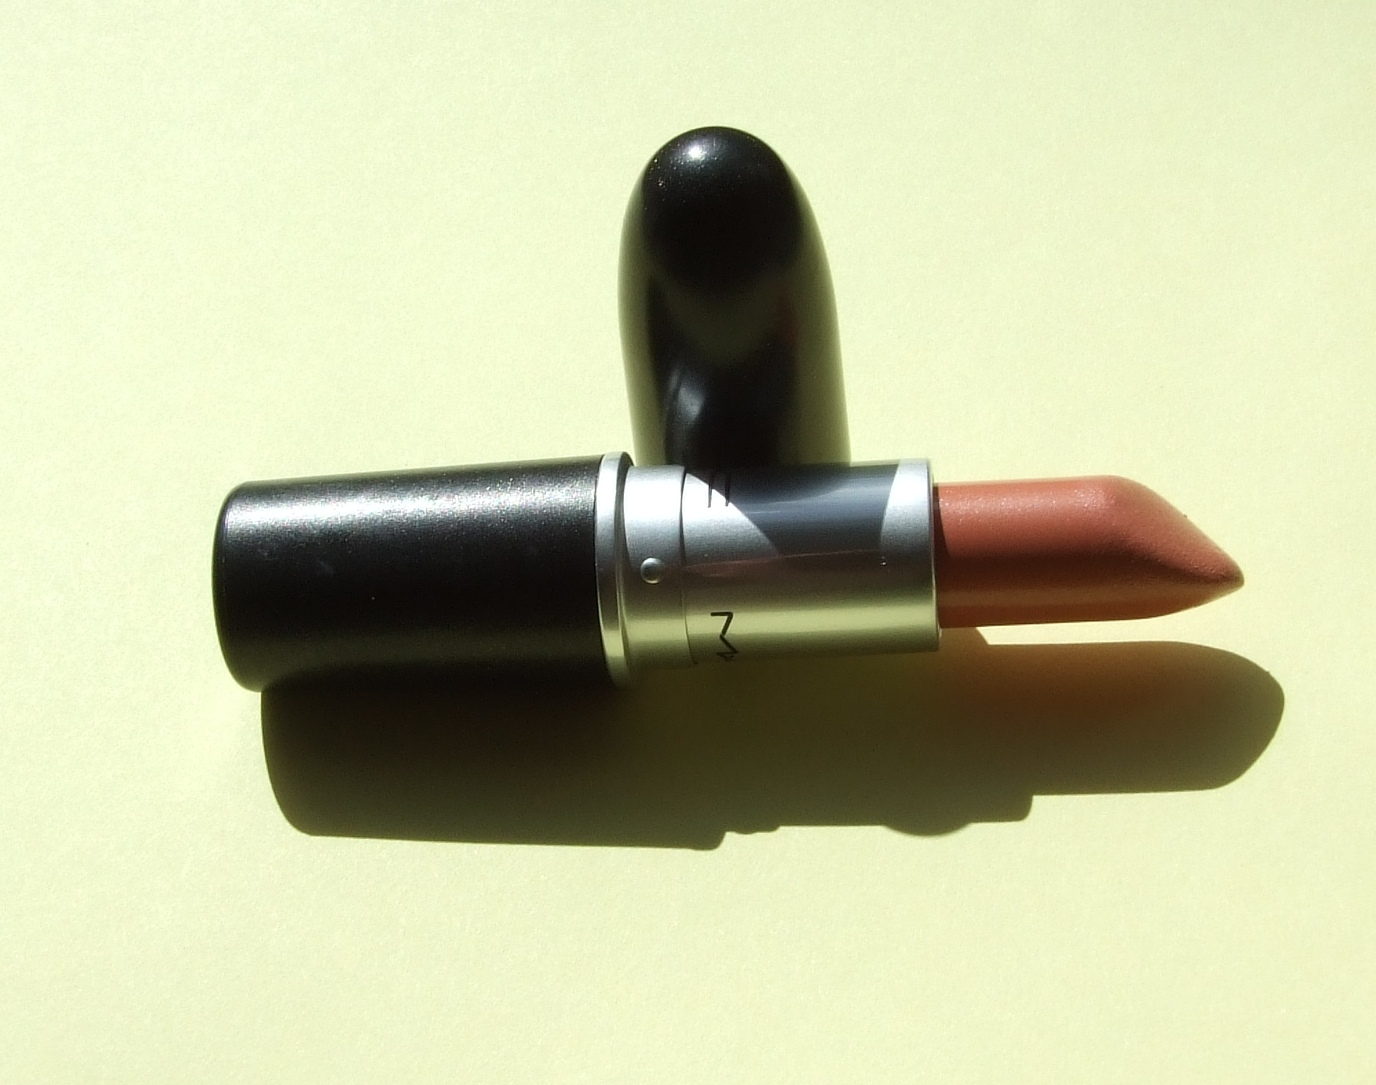 MAC Shy Girl Lipstick - Review | Girls lipstick, Mac shy girl, Lipstick review